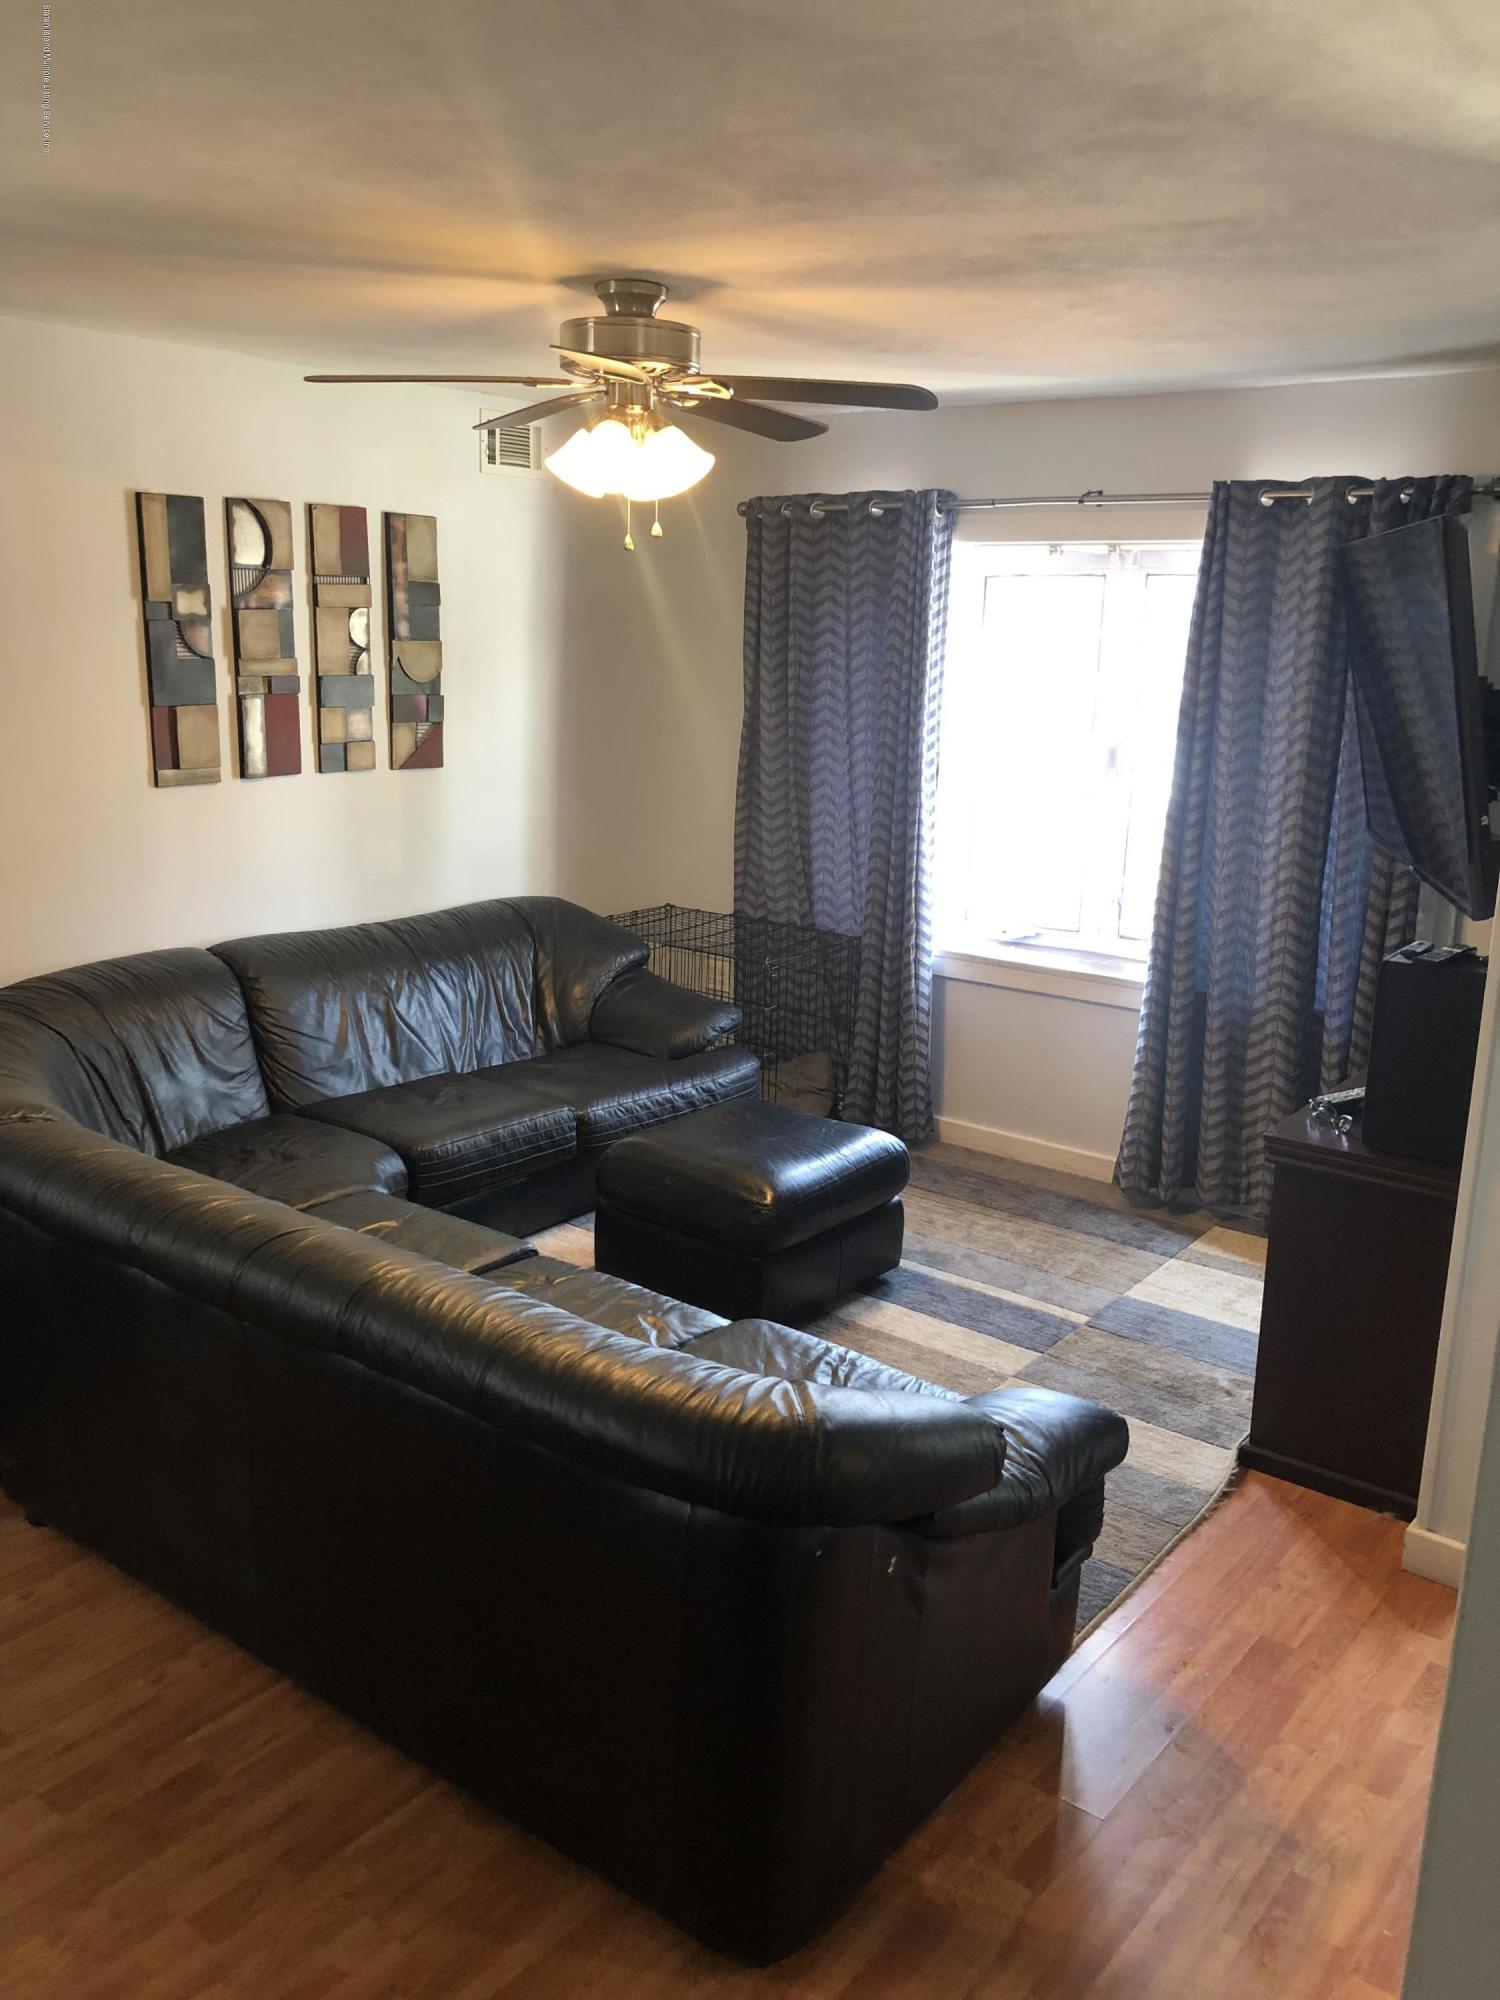 Single Family - Semi-Attached 39 Church Avenue  Staten Island, NY 10314, MLS-1130116-3